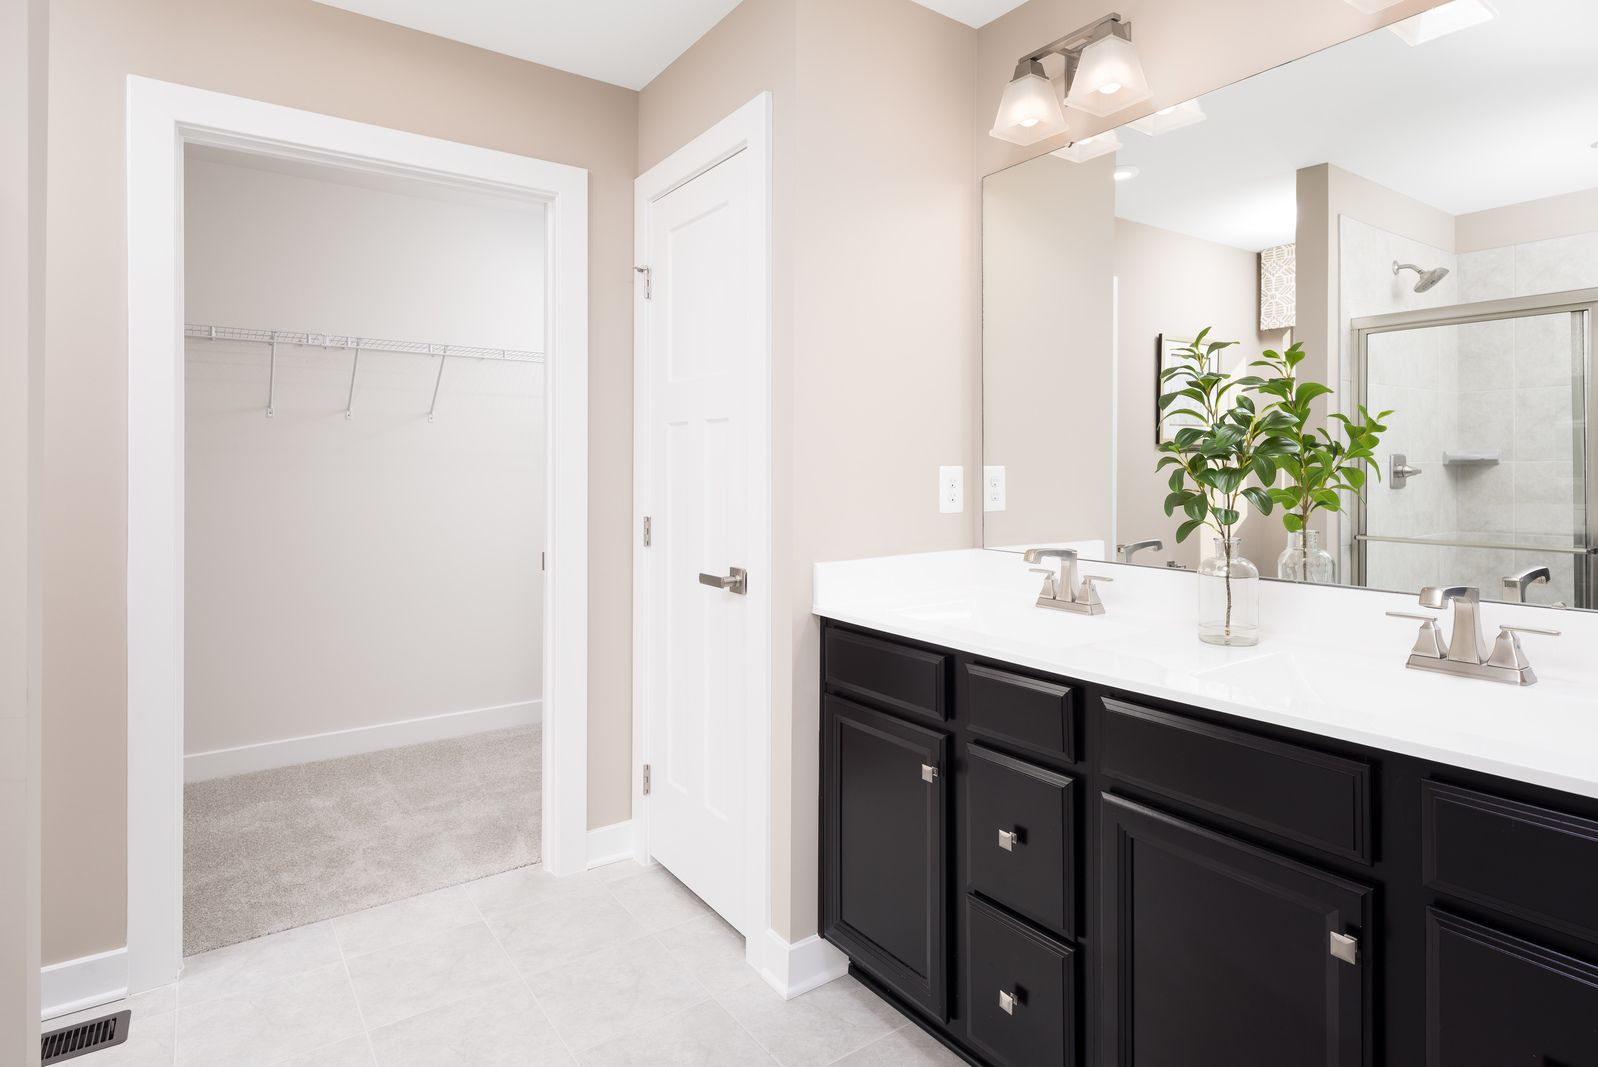 Bathroom featured in the Eden Cay By Ryan Homes in Norfolk-Newport News, VA